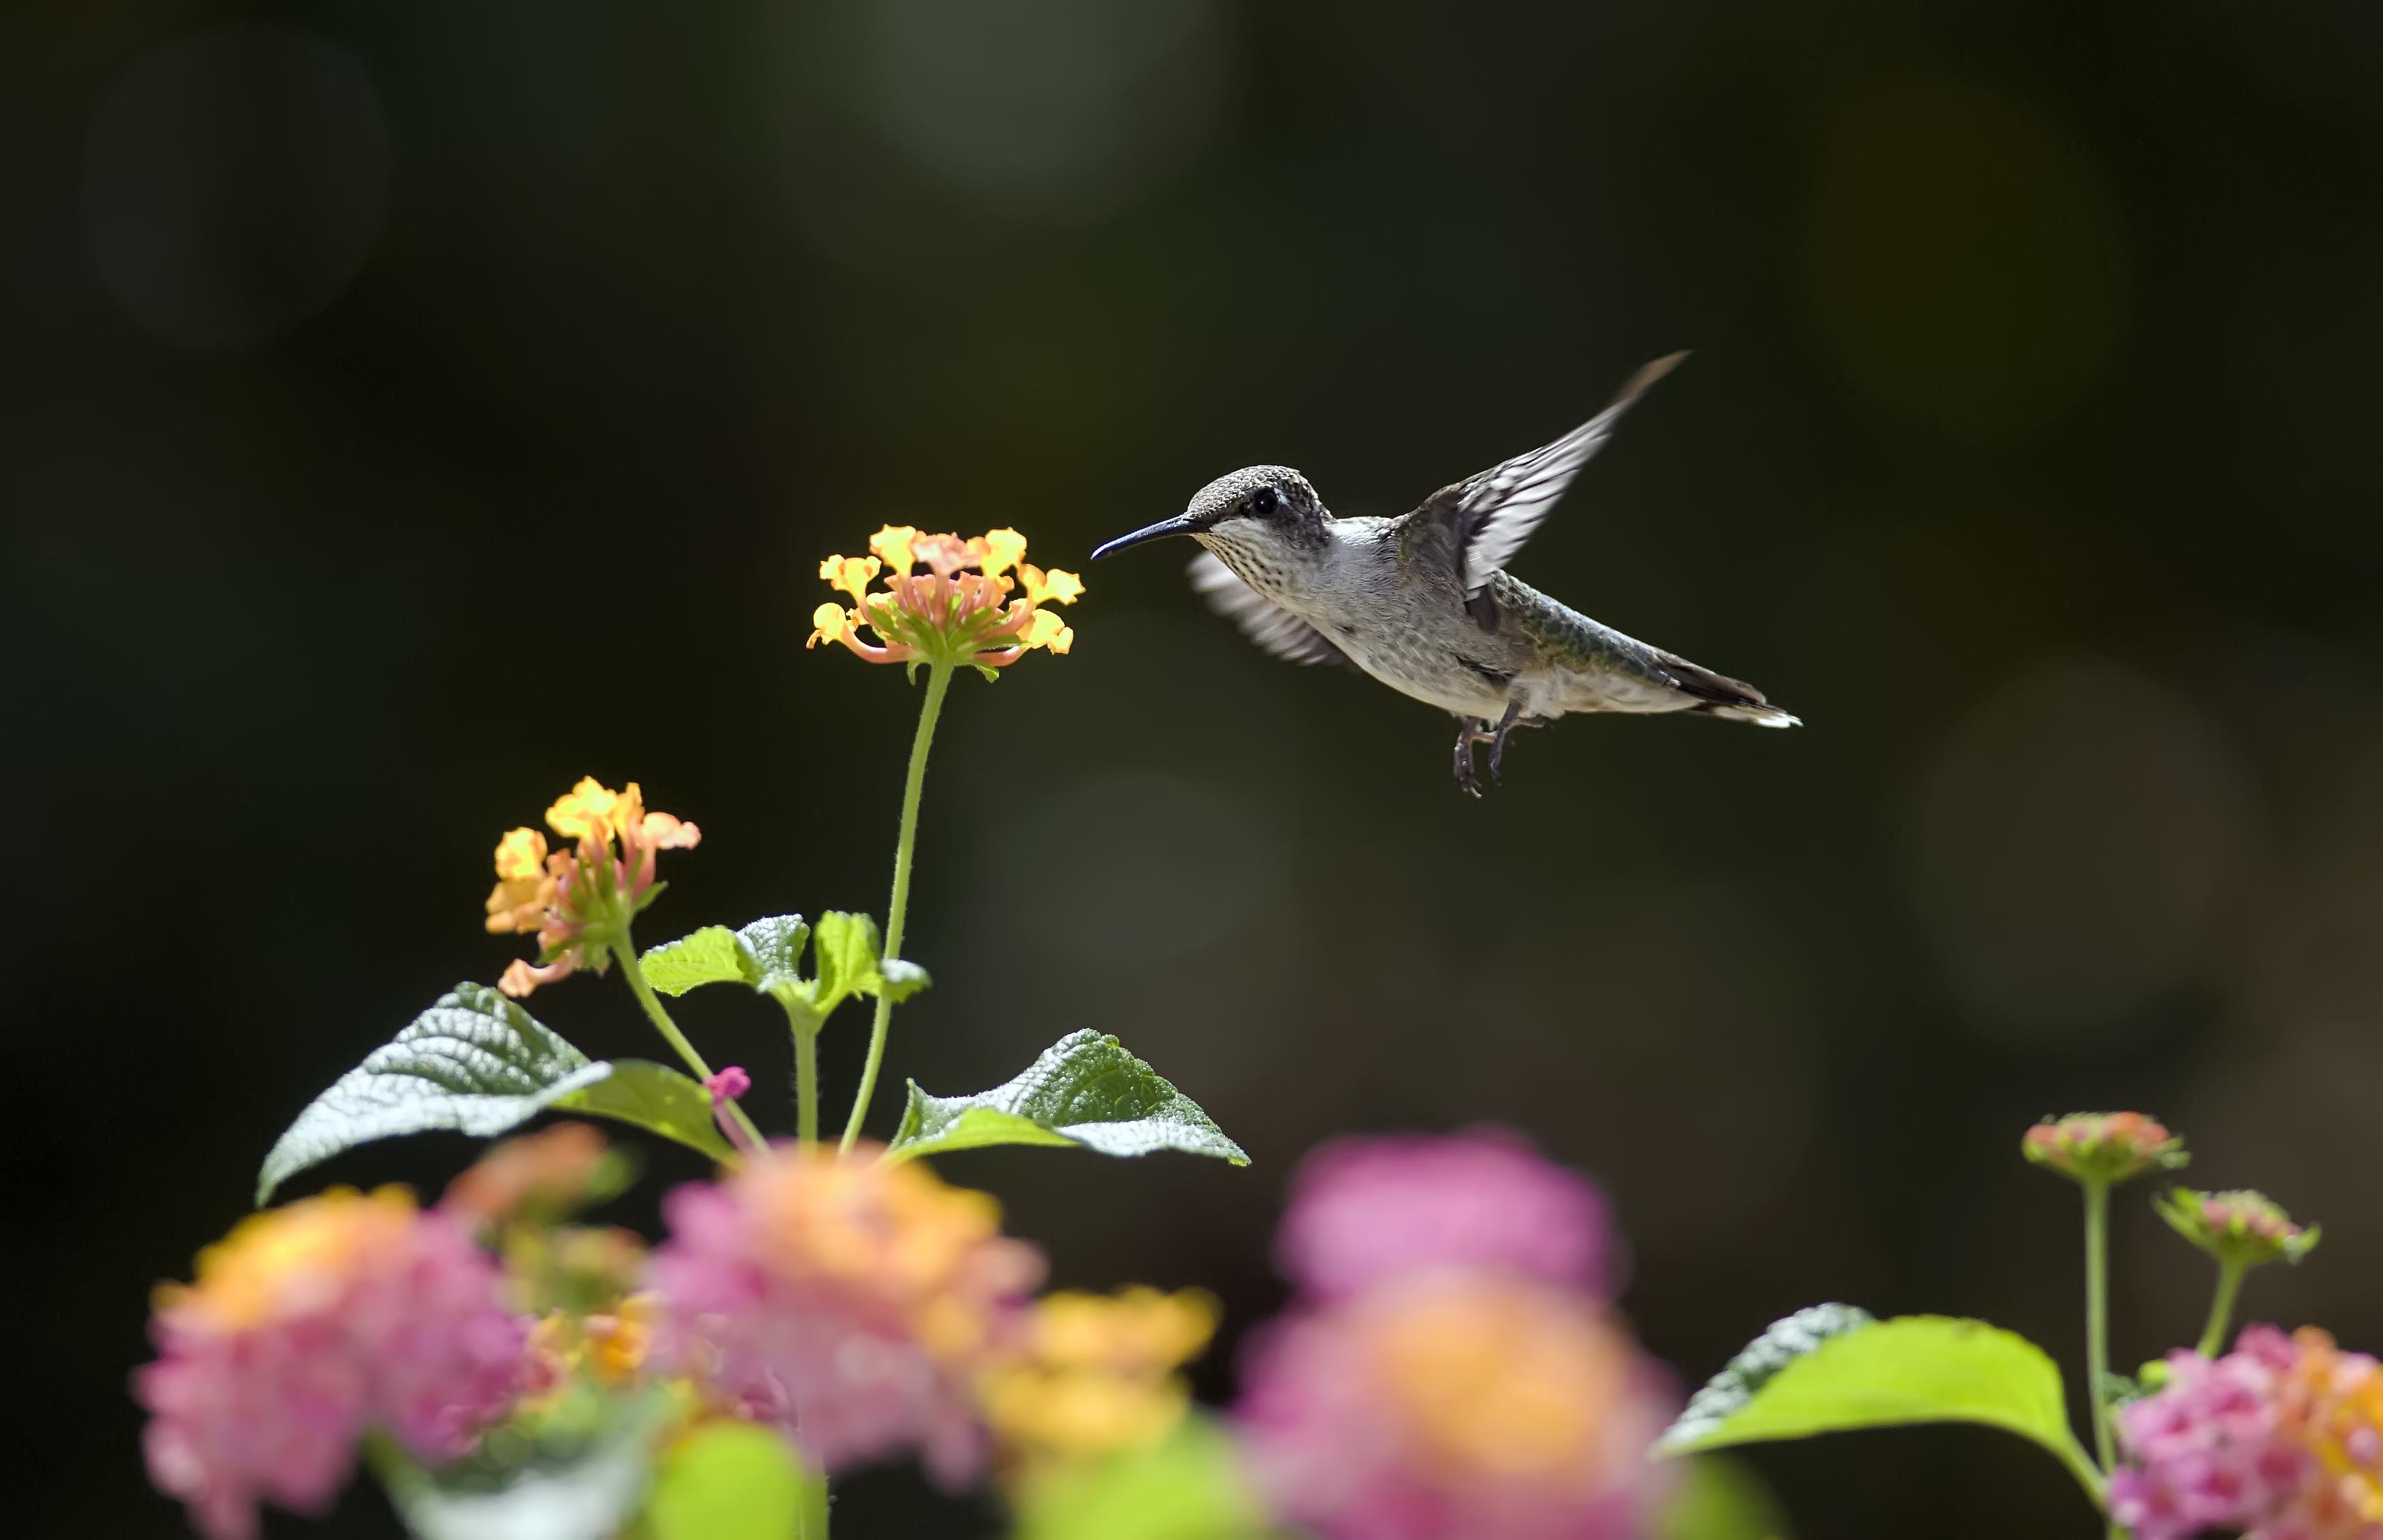 Hummingbirds flowers sunny nectar bird bokeh wallpaper 3428x2216